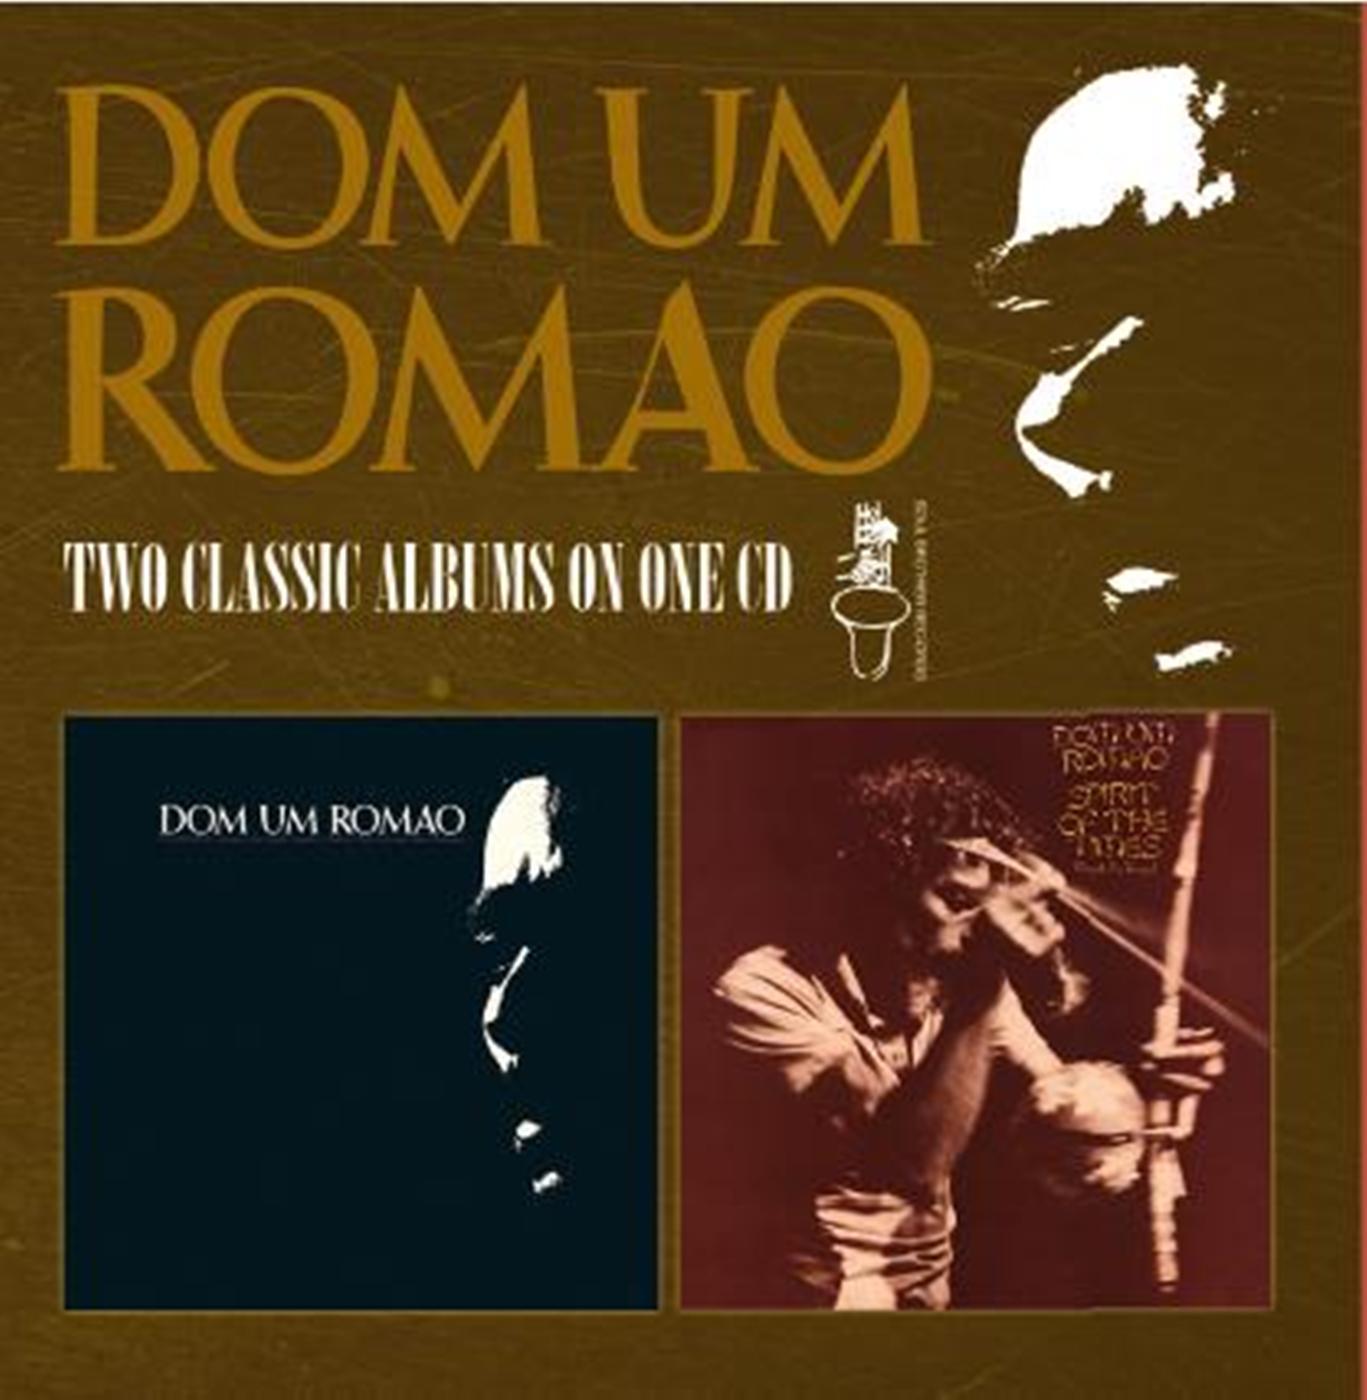 Dom Un Romao/SELF TITLED & SPIRIT OF CD